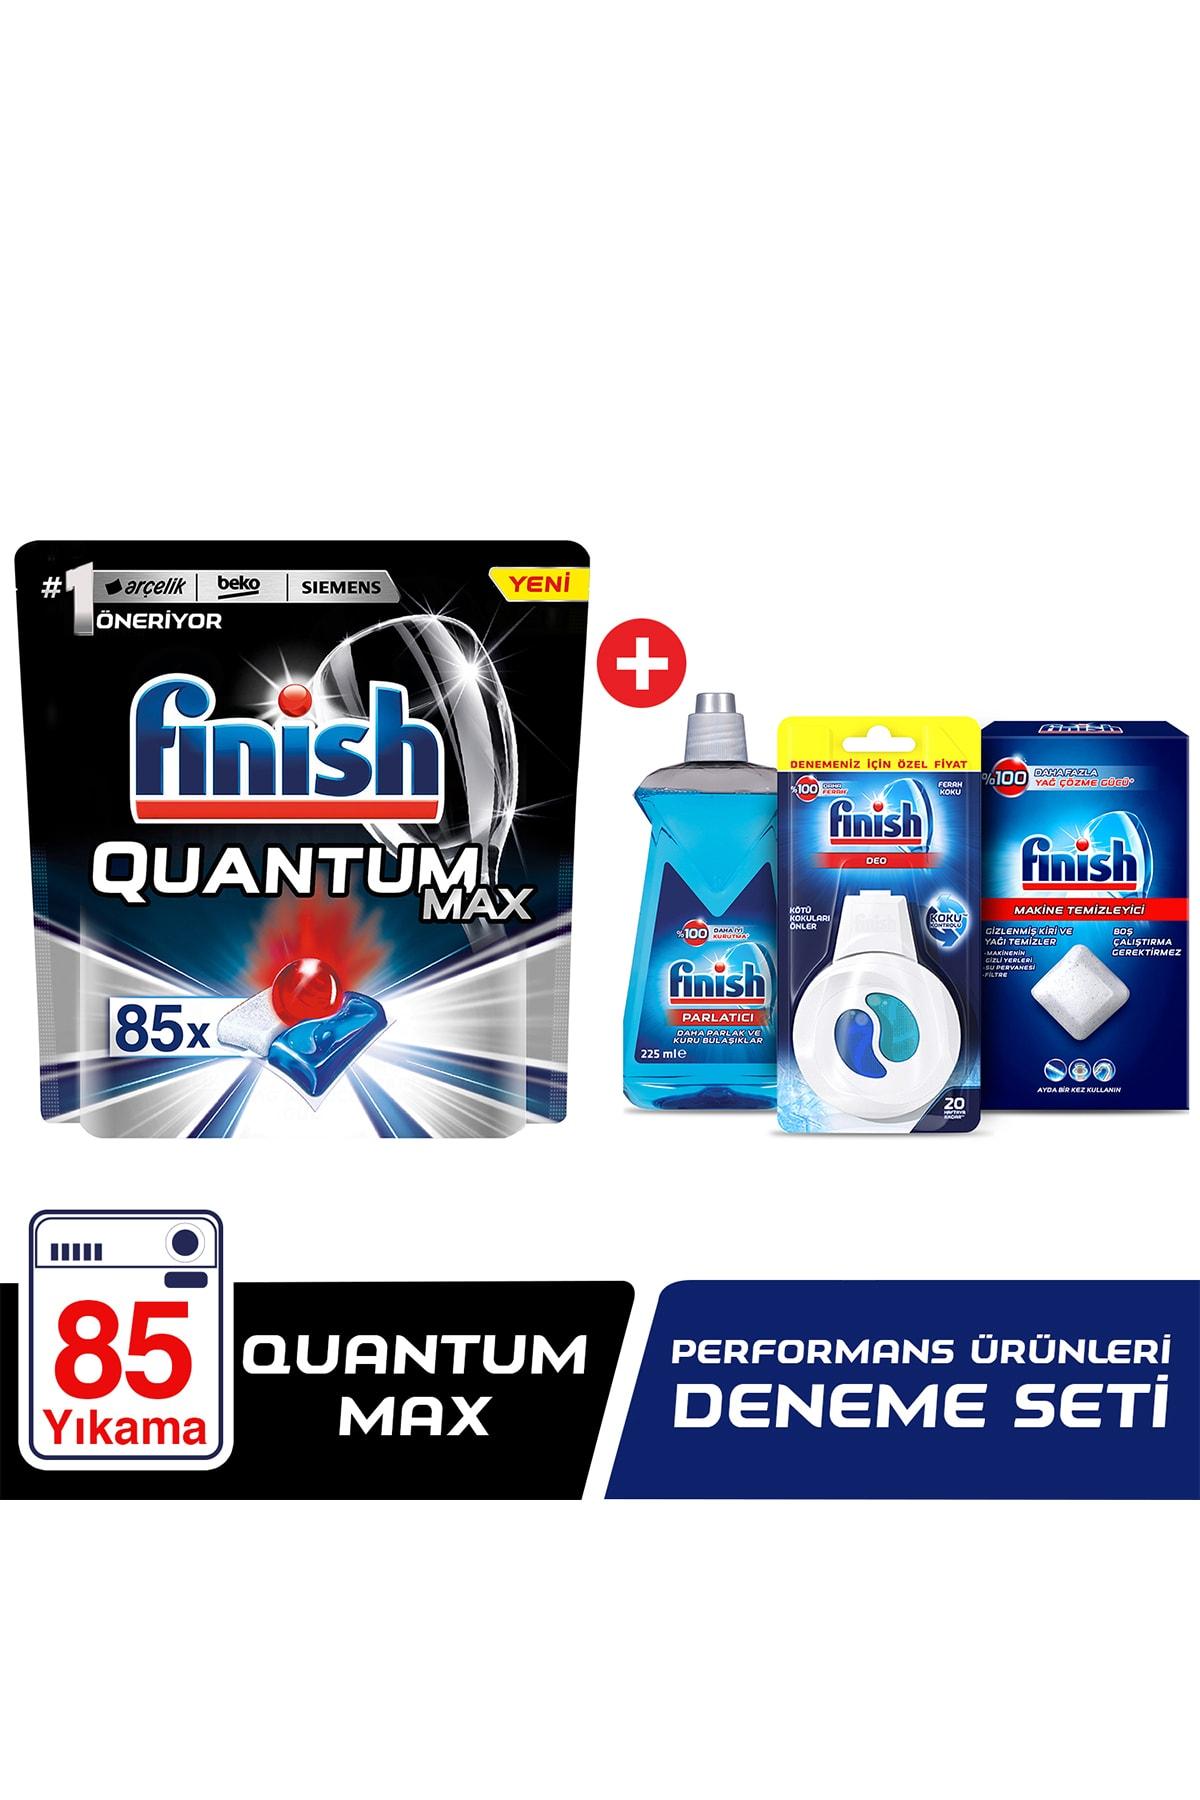 Finish Quantum Max 85 Kapsül Bulaşık Makinesi Deterjanı + Performans Deneme Seti 1